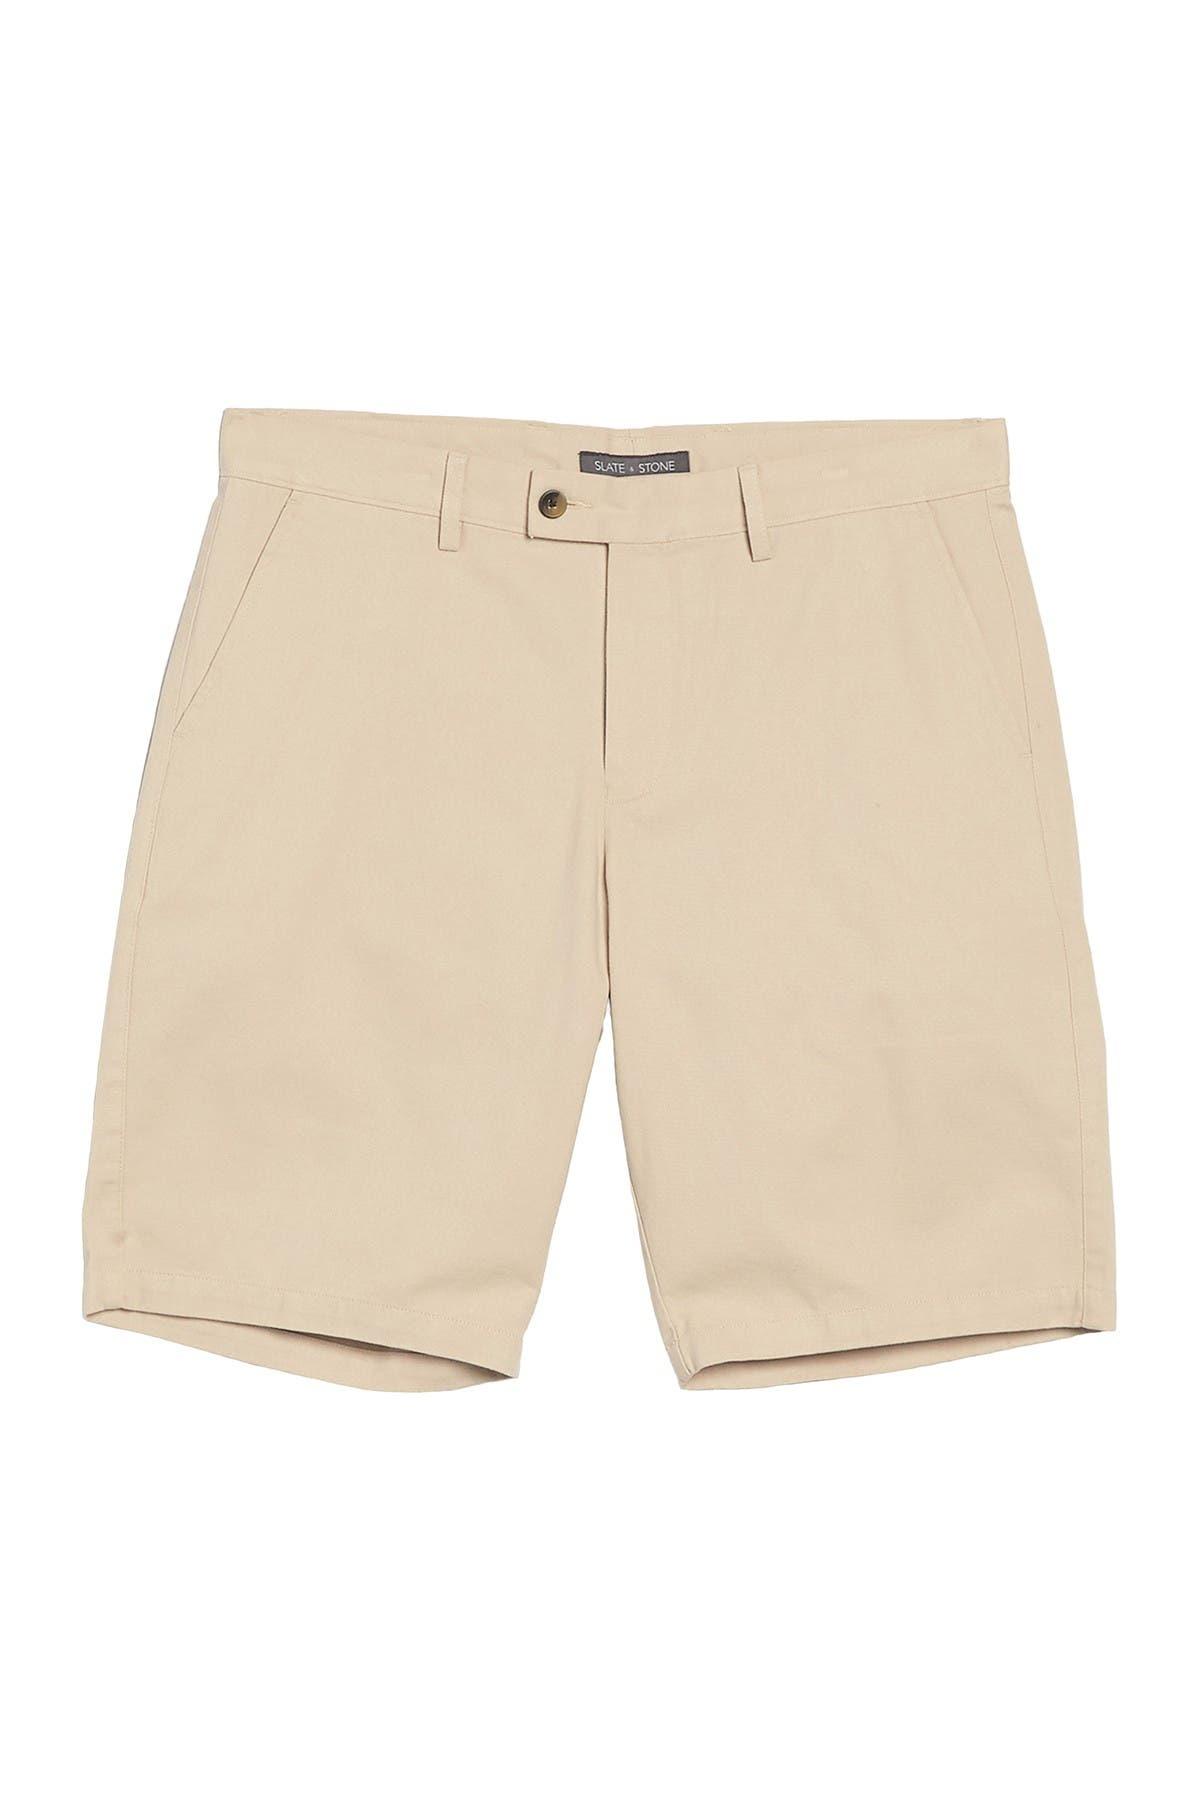 Image of Slate & Stone Tab Woven Shorts